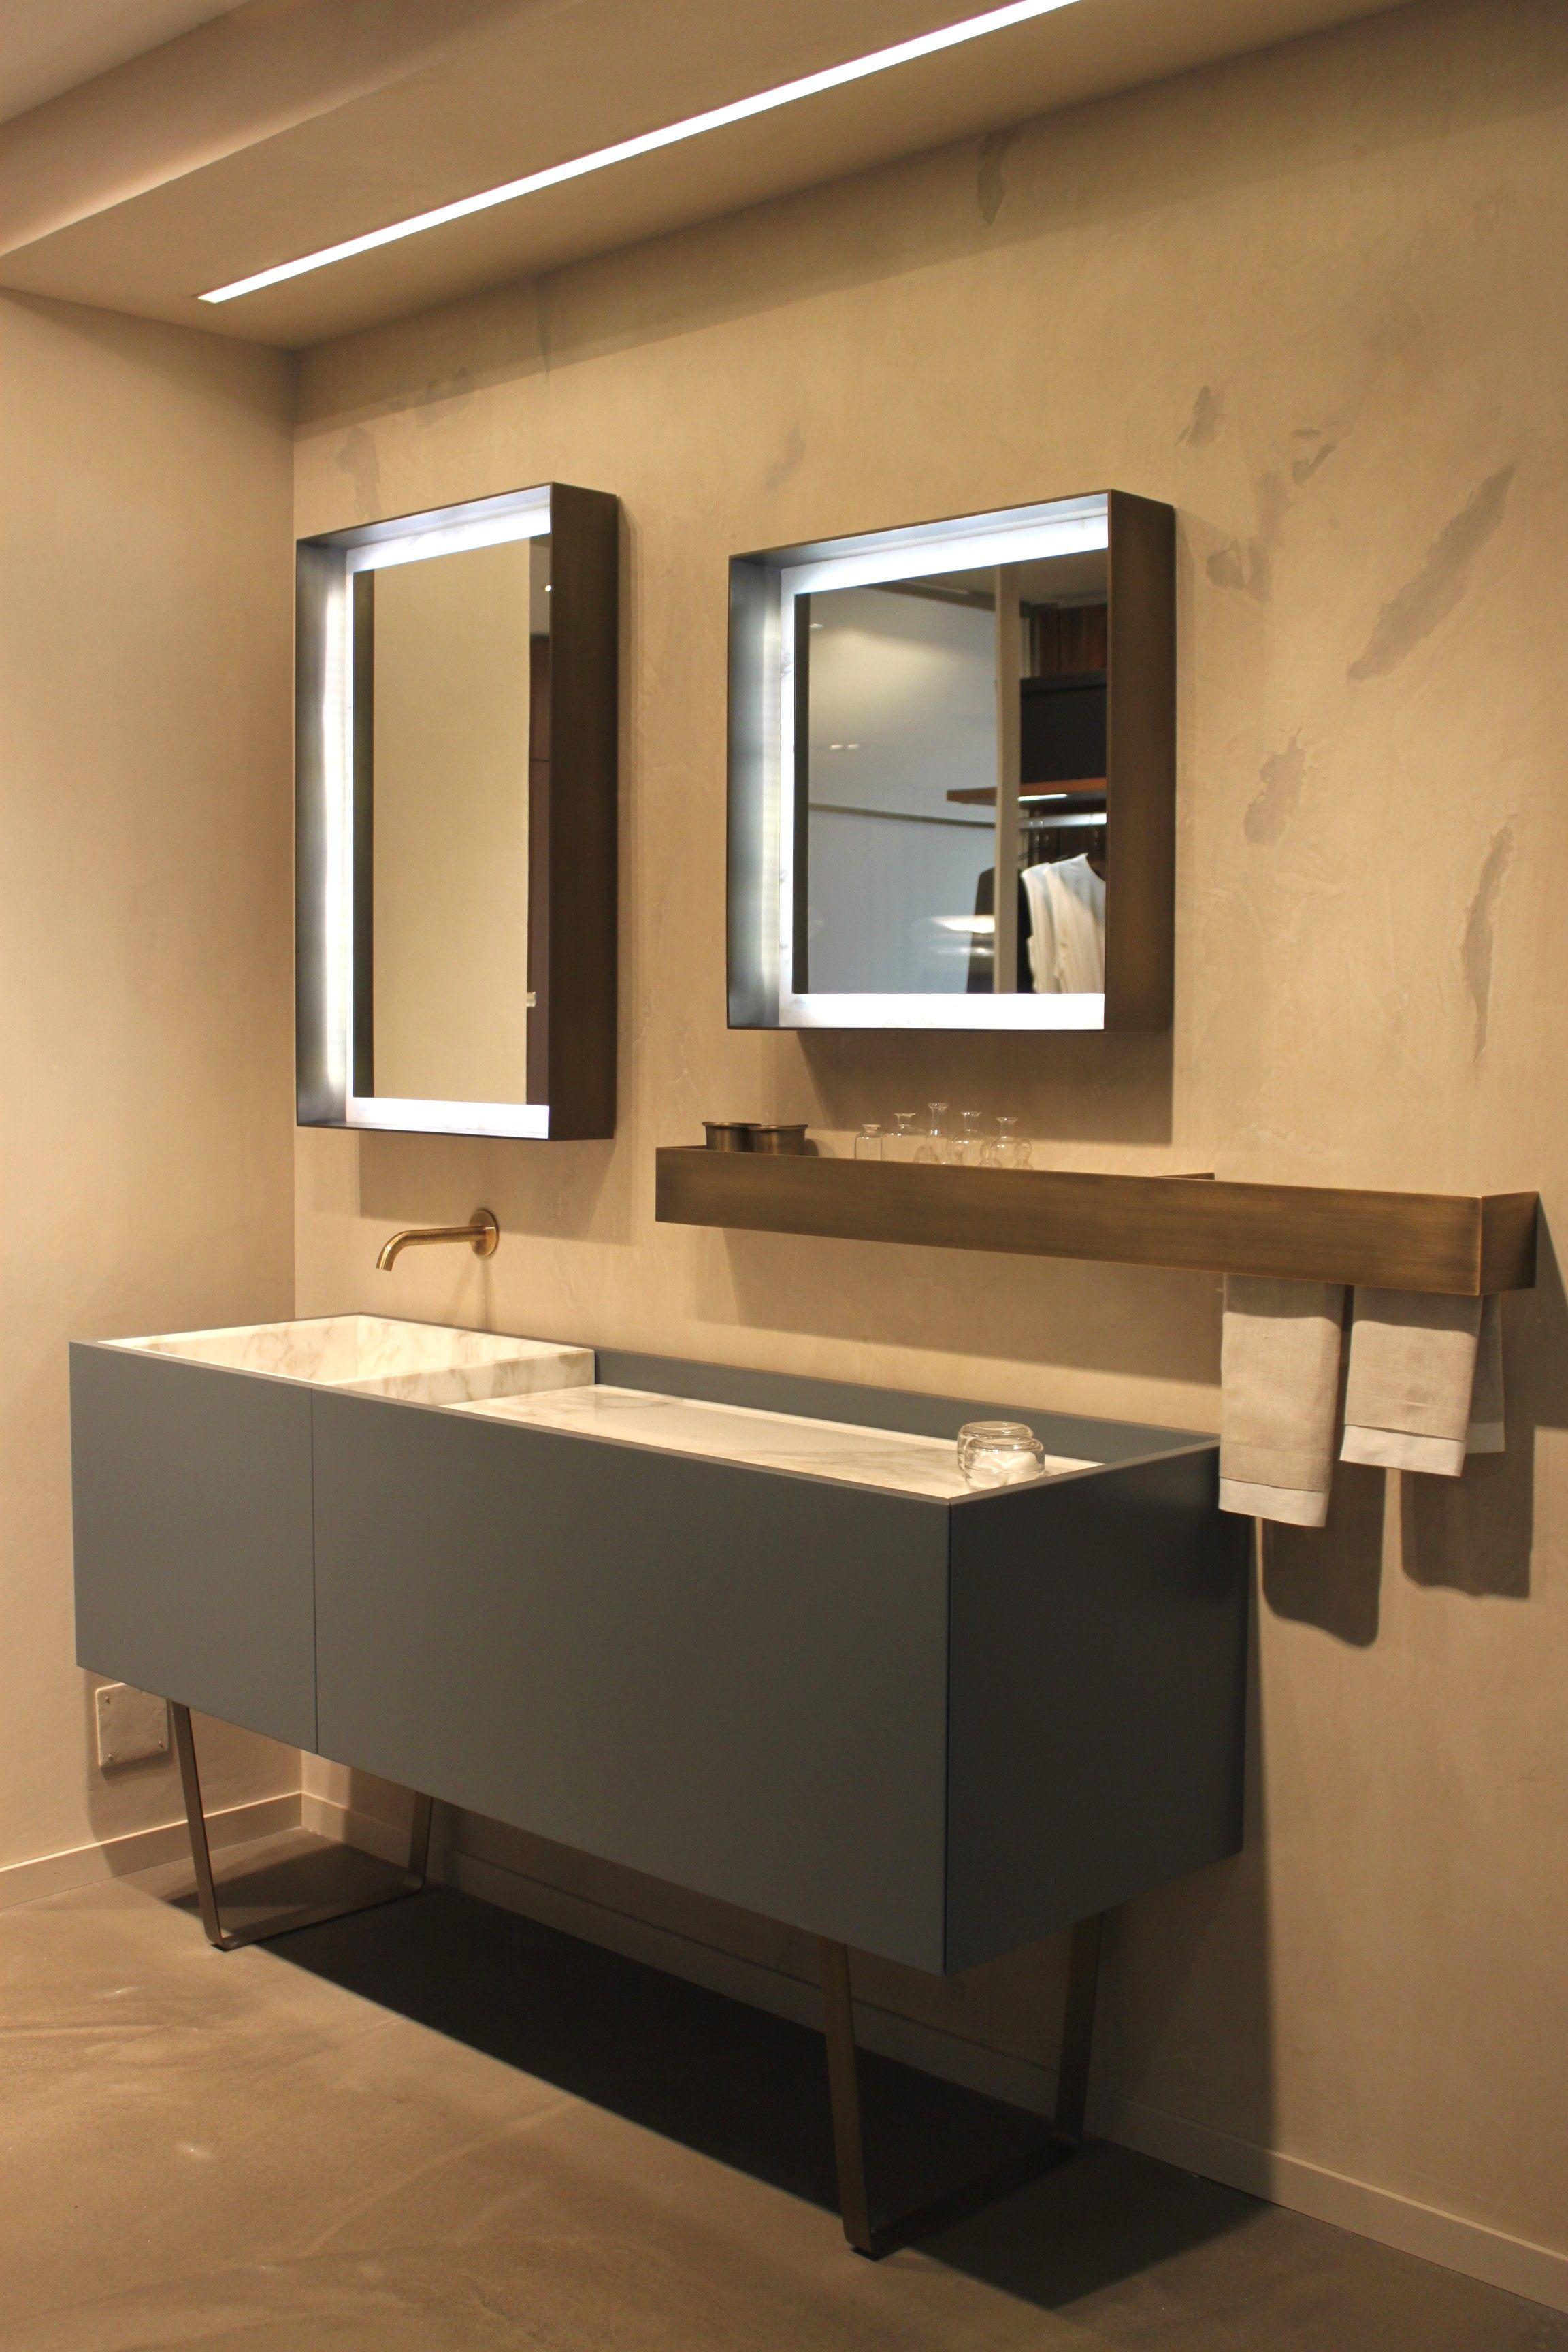 Idea de Cocinas Moretti en Showroom Moretti | Baño ...